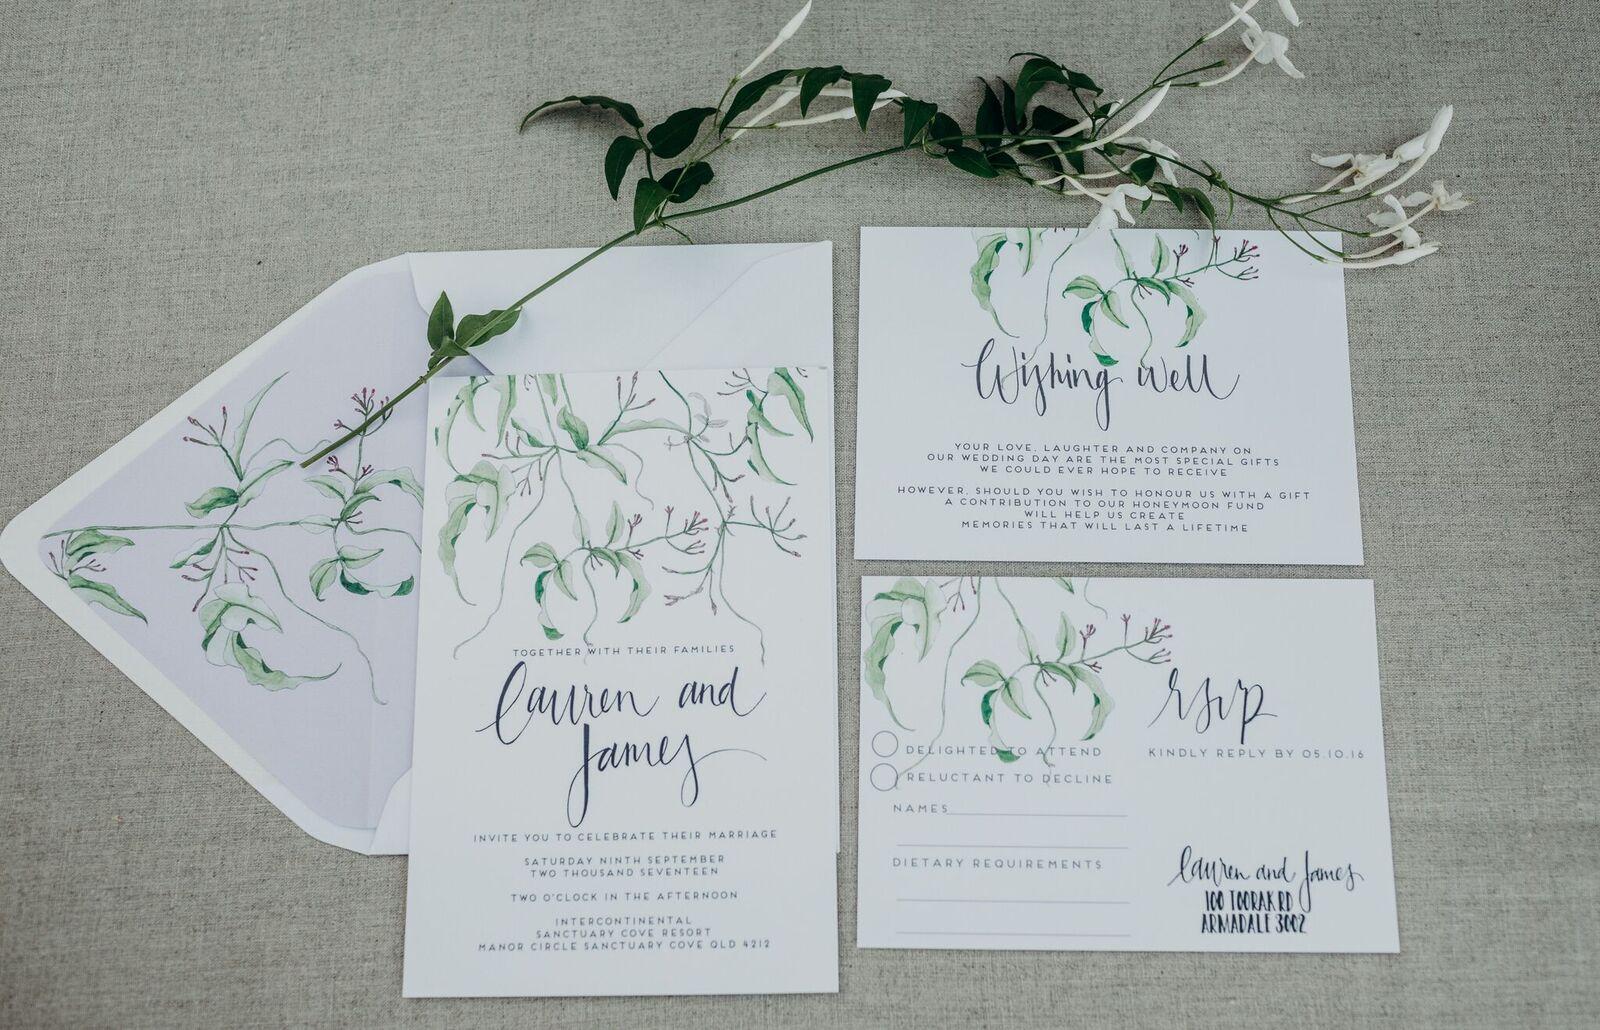 CLOUD CATCHER STUDIO GOLD COAST WEDDINGS